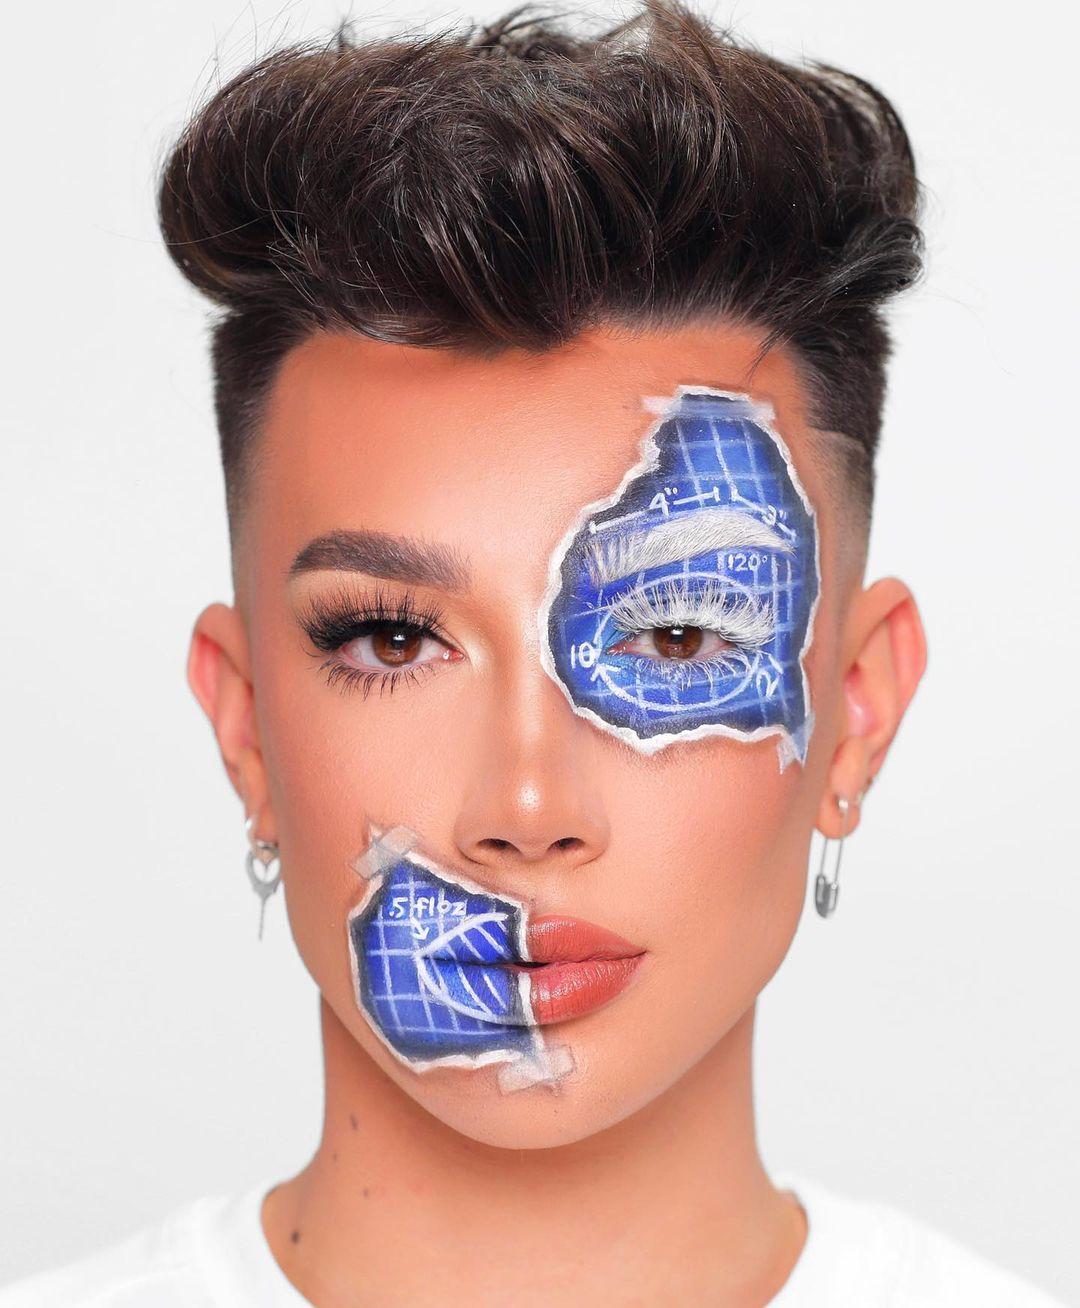 James Charles S Instagram Profile Post Work In Progress Recreated This Look From Brimonetxo James Charles Creative Makeup Looks Amazing Halloween Makeup